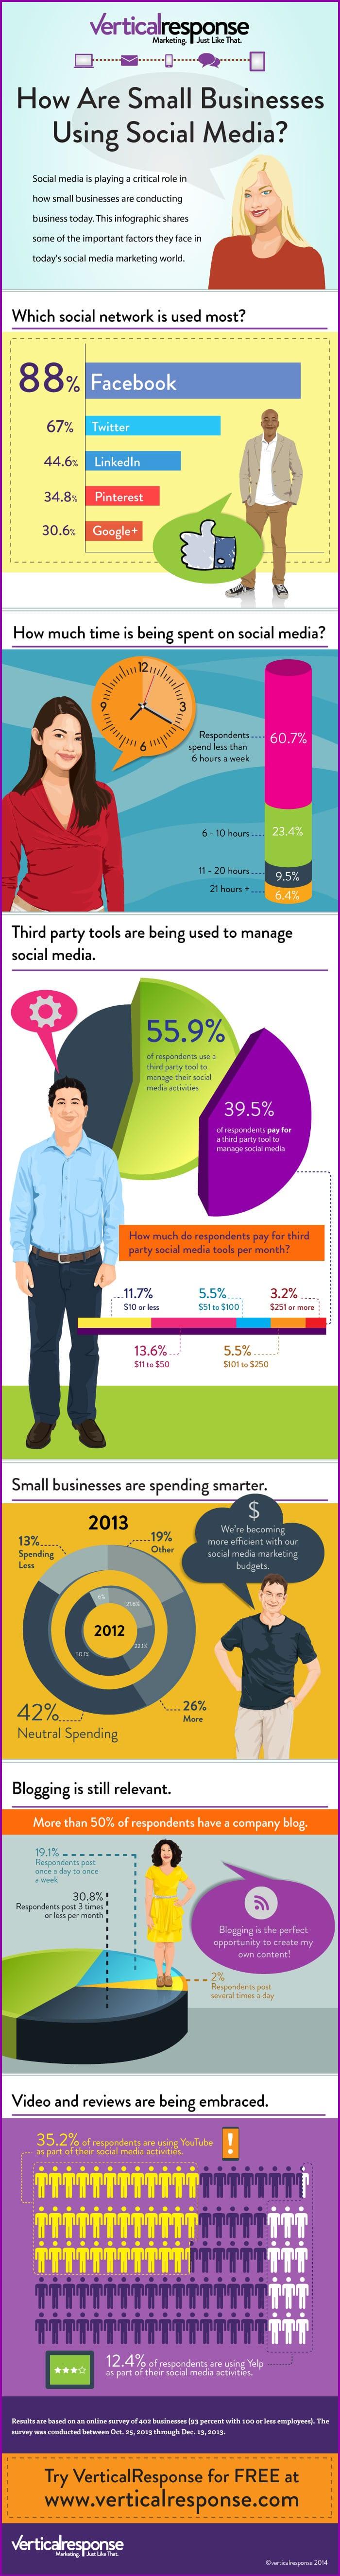 Social media binnen het MKB - liken en bloggen populair [infographic]